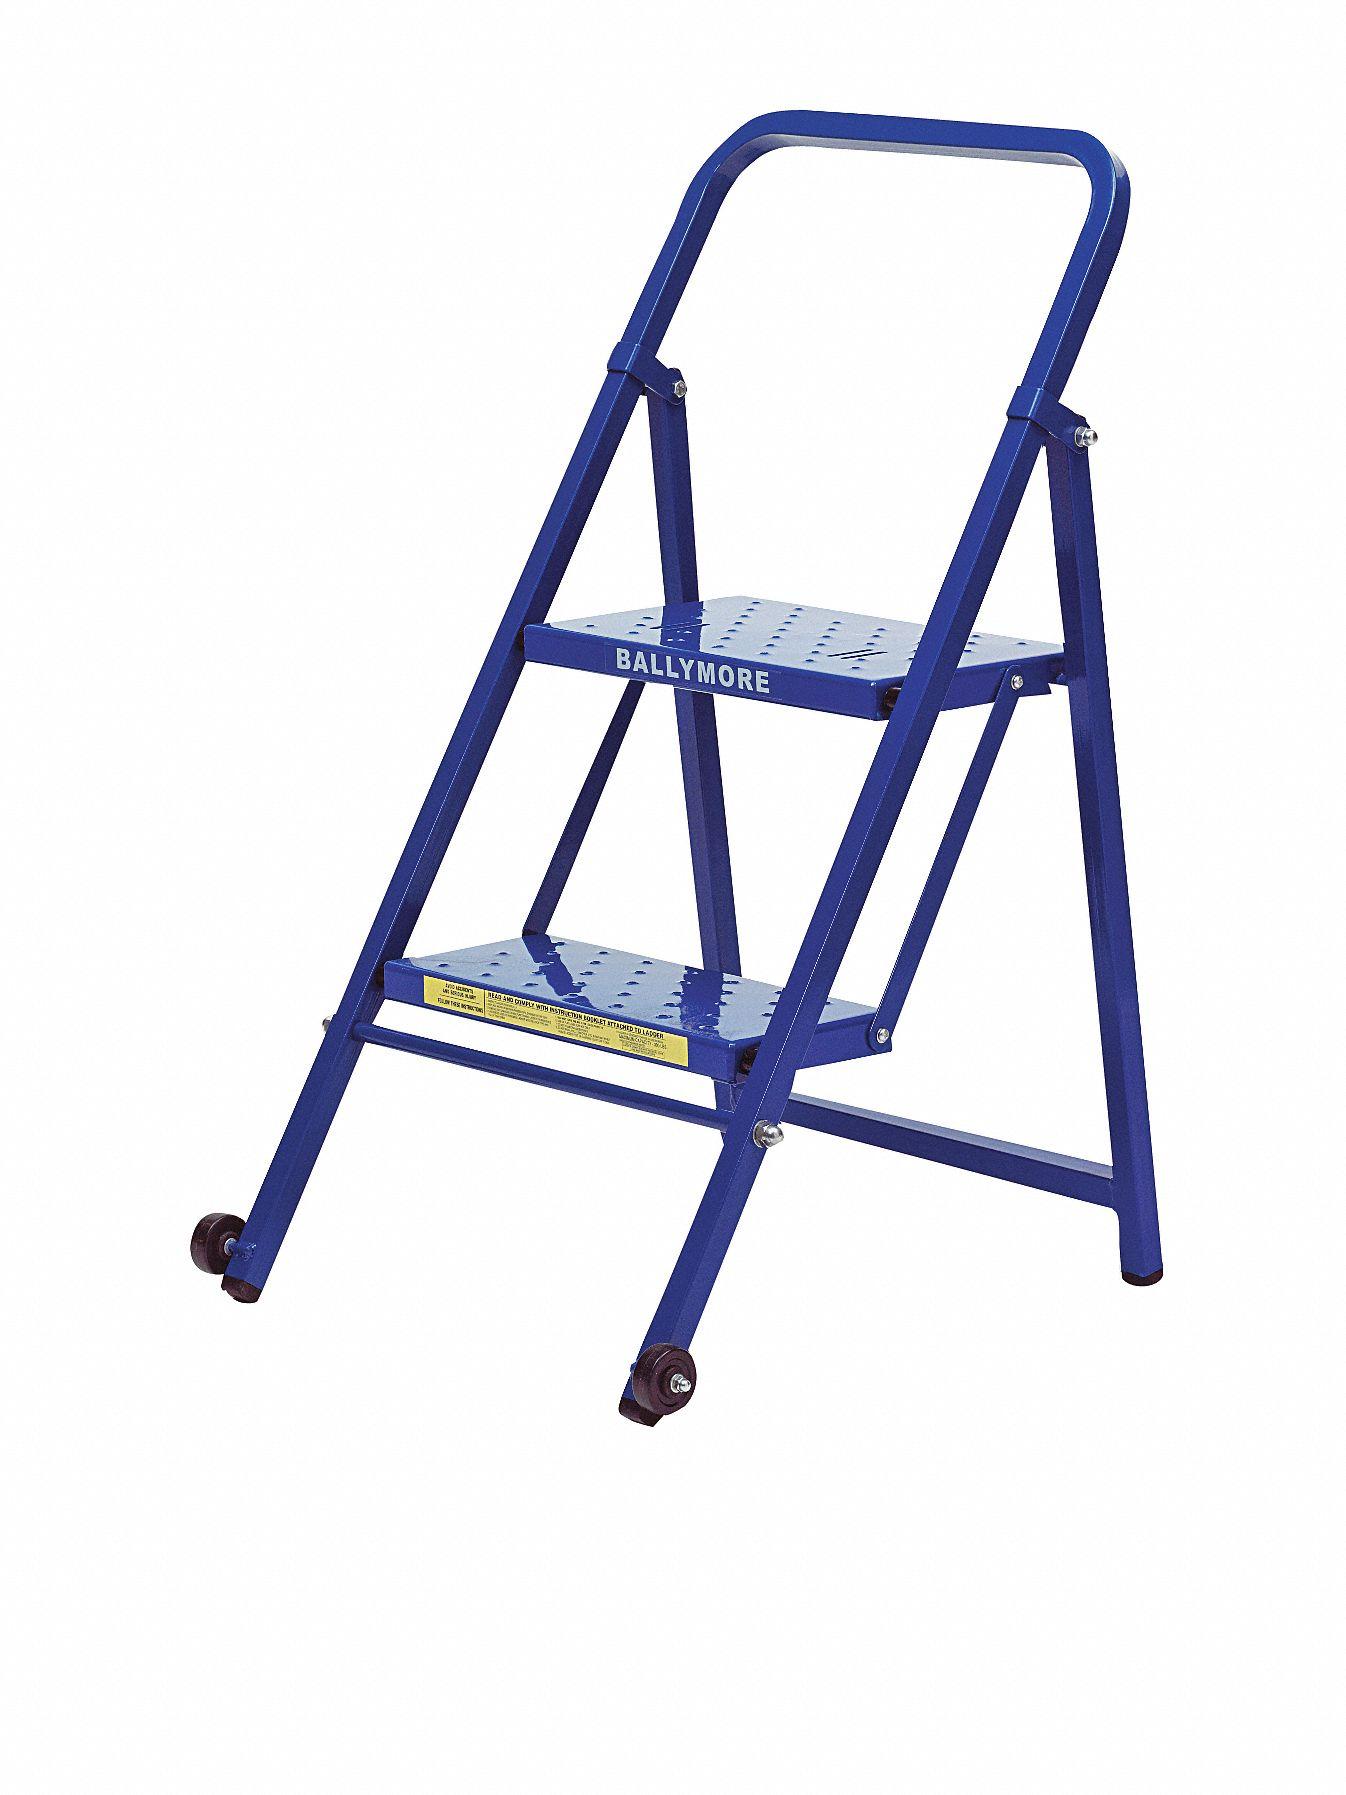 Ballymore Folding Rolling Ladder Steel 20 In H 9cud8